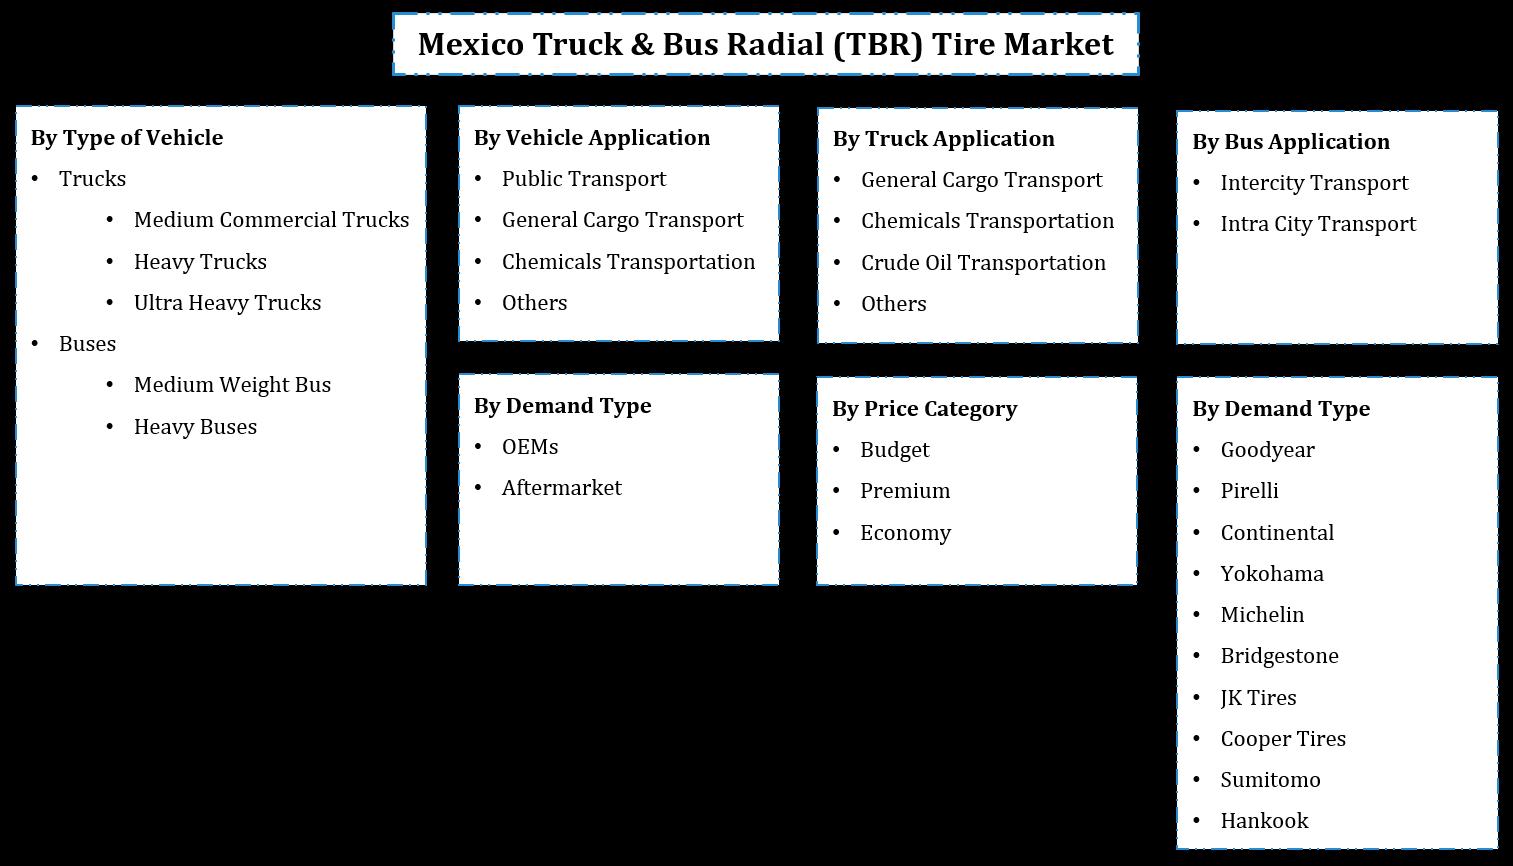 Mexico Truck & Bus Radial Tire Market Segmentation